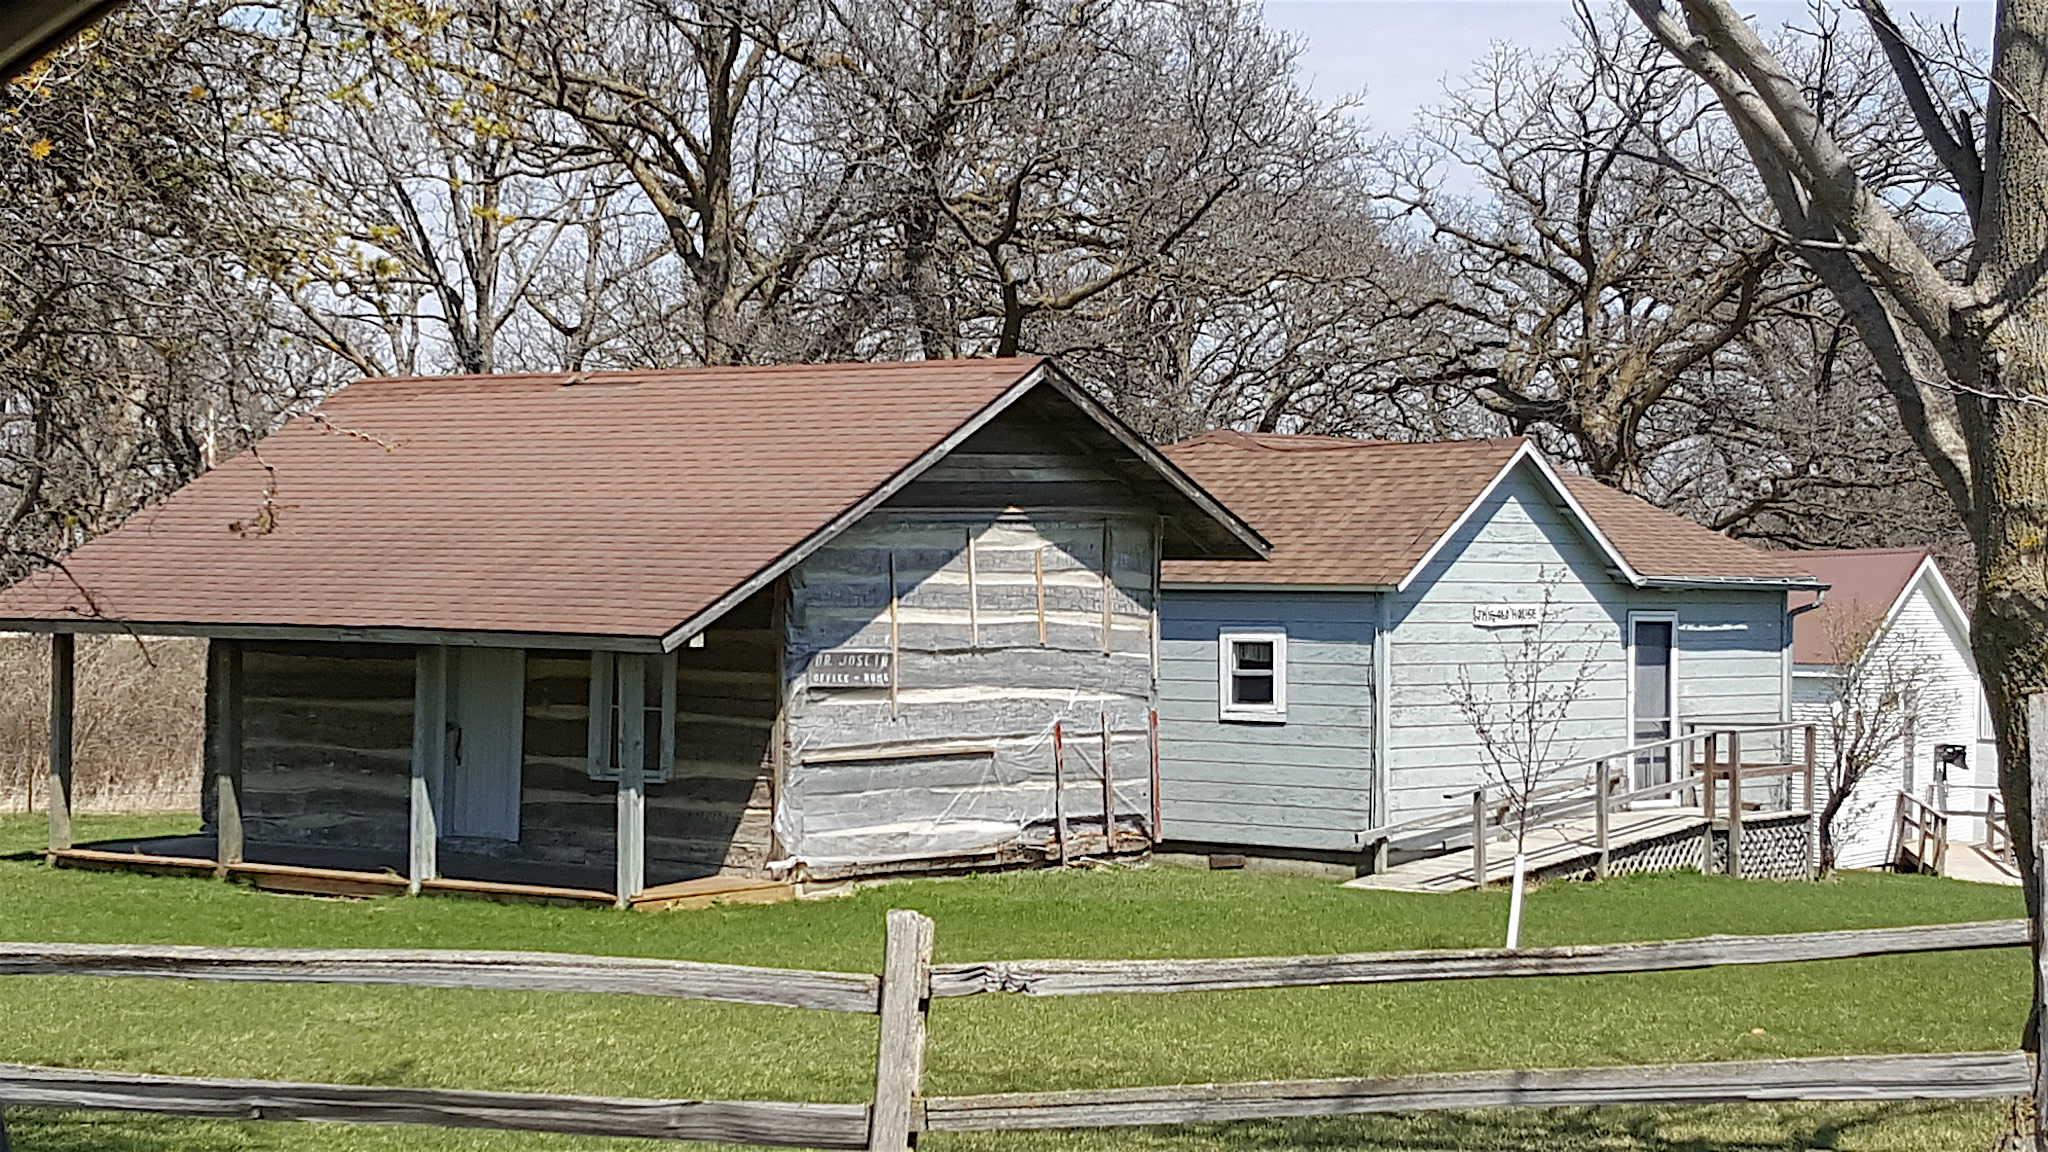 Edinburgh Ghost Town Pioneer Village - BEST Places to Visit in Central East Iowa